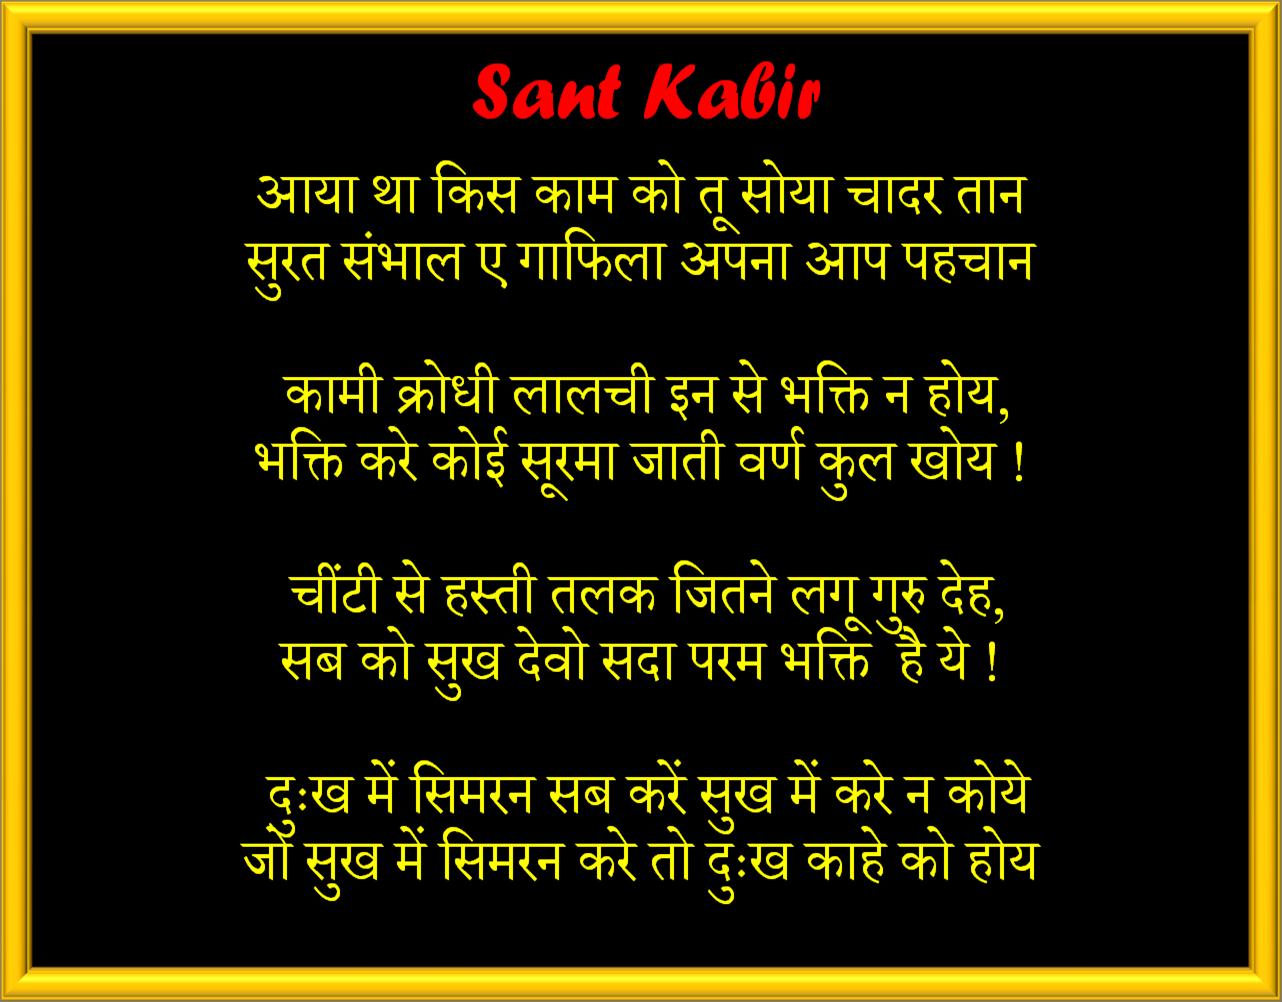 Radha Soami Quotes Wallpaper Sant Kabir Doha Saint Kabir Pinterest Doha Poem And